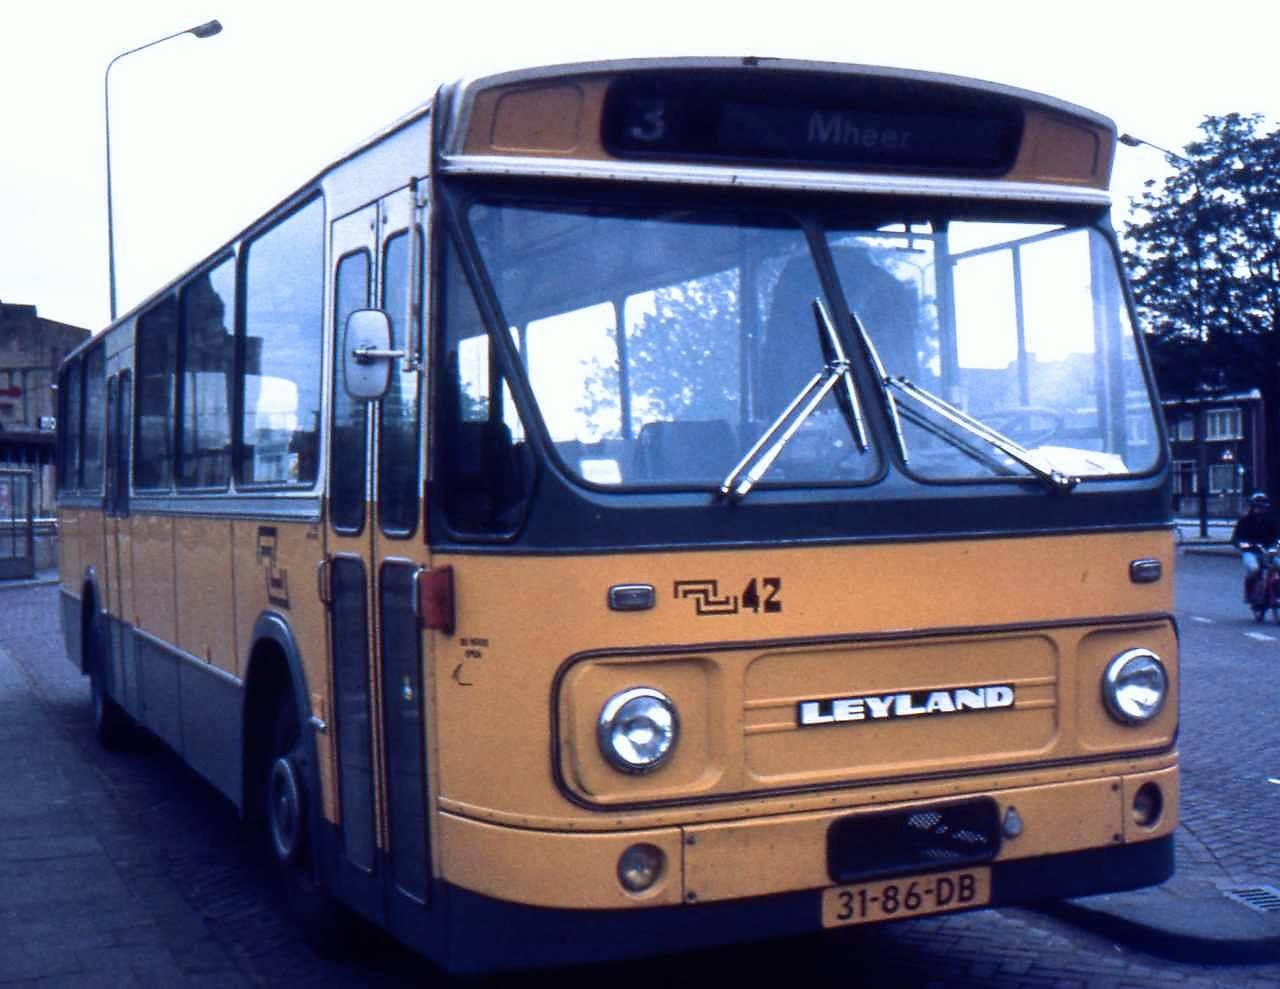 42--1975-04-25-42-31-86-DB-Leyland-Verheul-LVB-668-LVB668-0022-1975-van-Rooijen-868-4928-1980-10-01-VSL-5-178